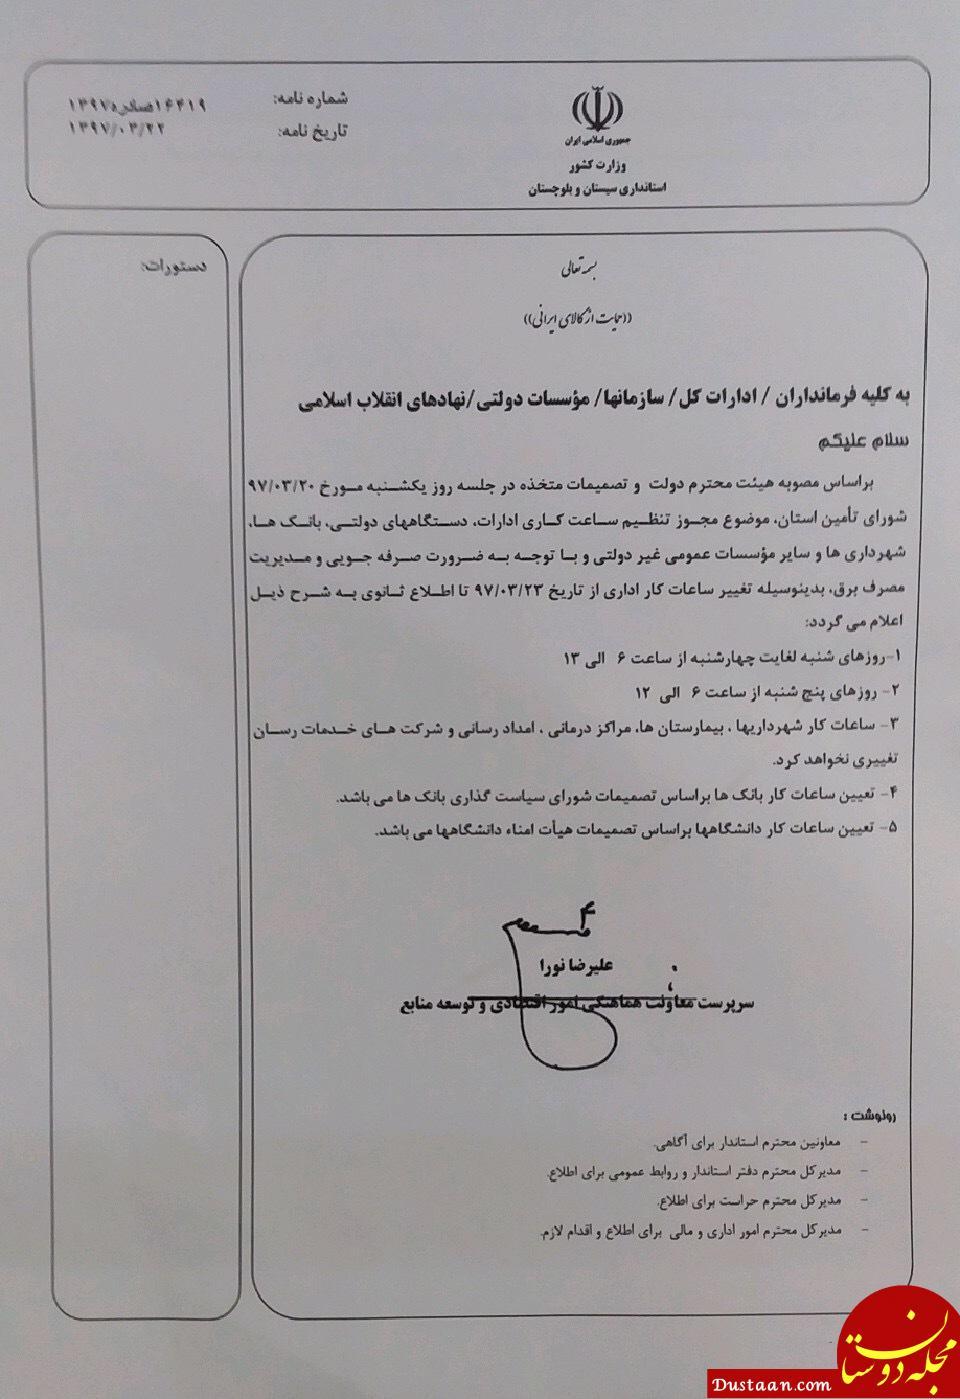 www.dustaan.com تغییر ساعت کاری دستگاه های اجرایی سیستان و بلوچستان